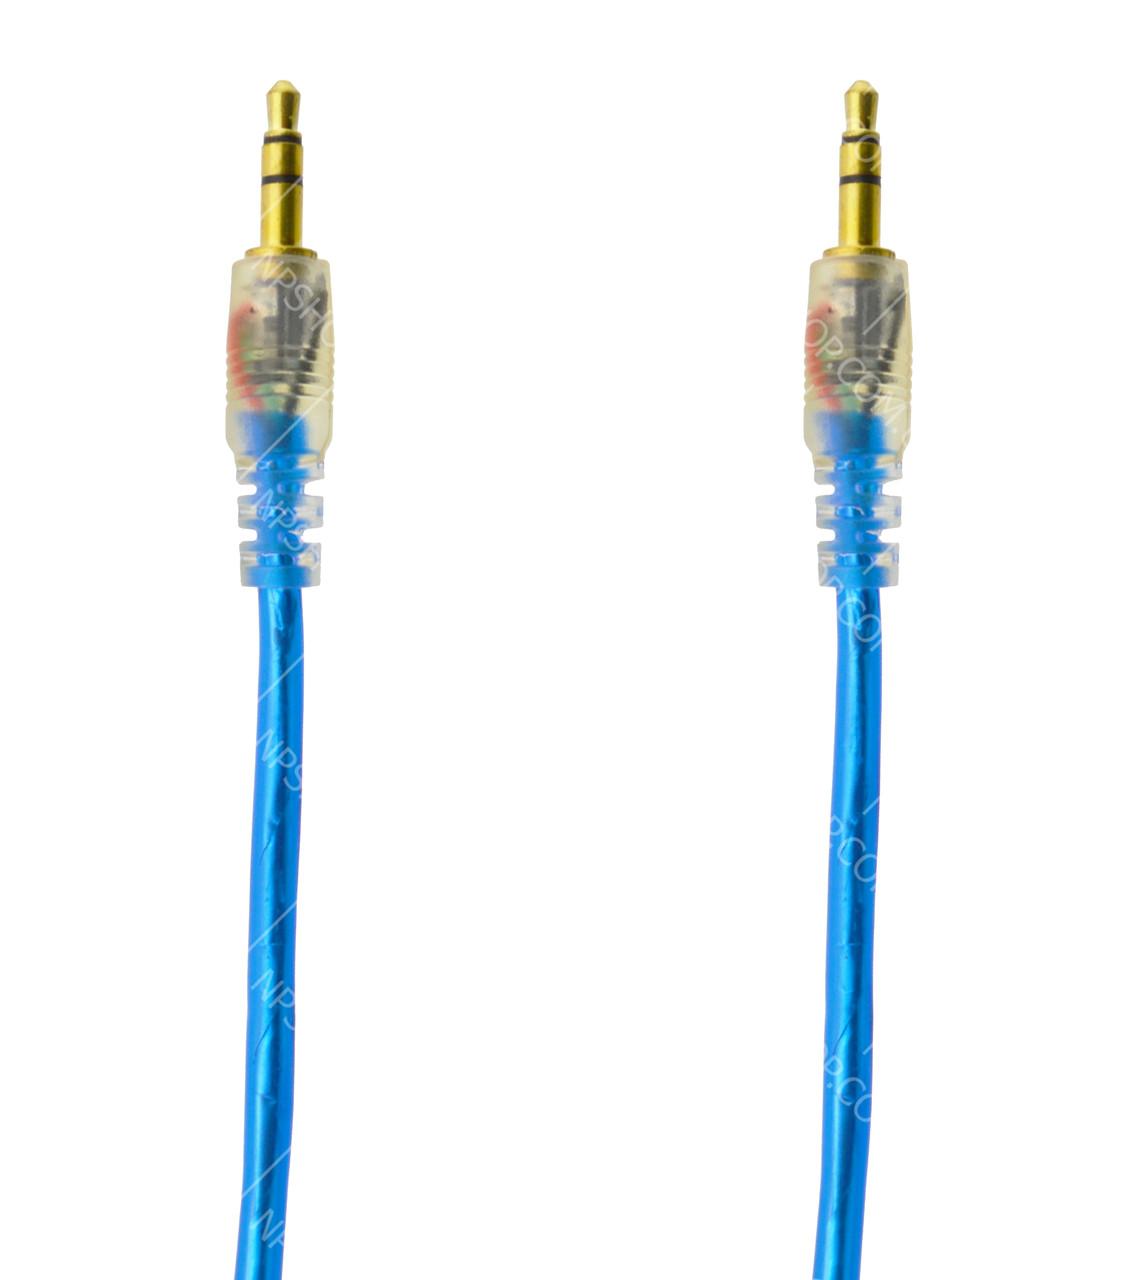 AUX аудио кабель 3,5мм DJI 1115 ПАПА-ПАПА 1 метра